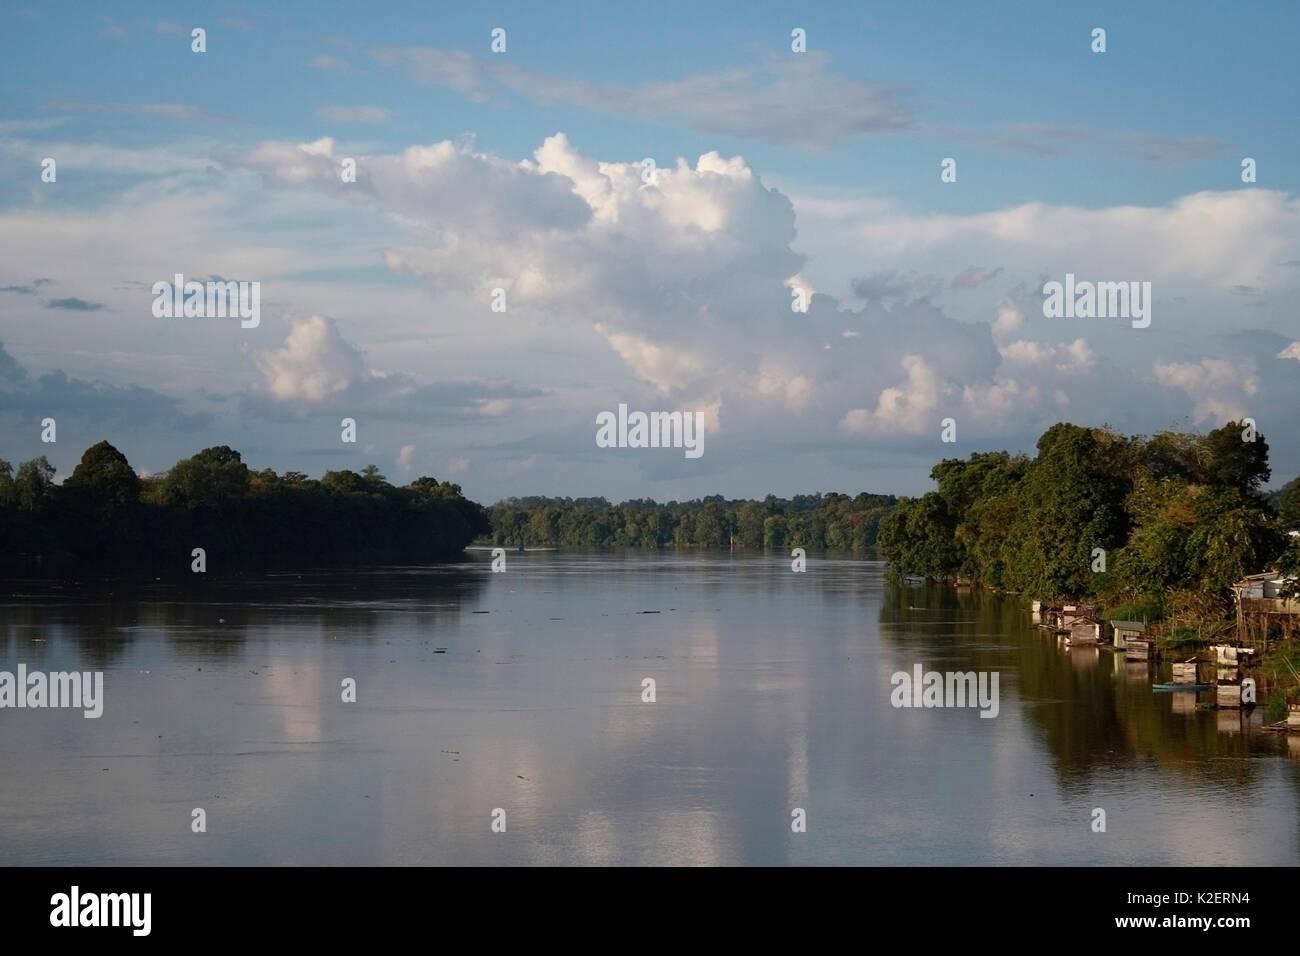 Kapuas river side, Singkawang, West Kalimantan, Indonesia Borneo. June 2010. - Stock Image